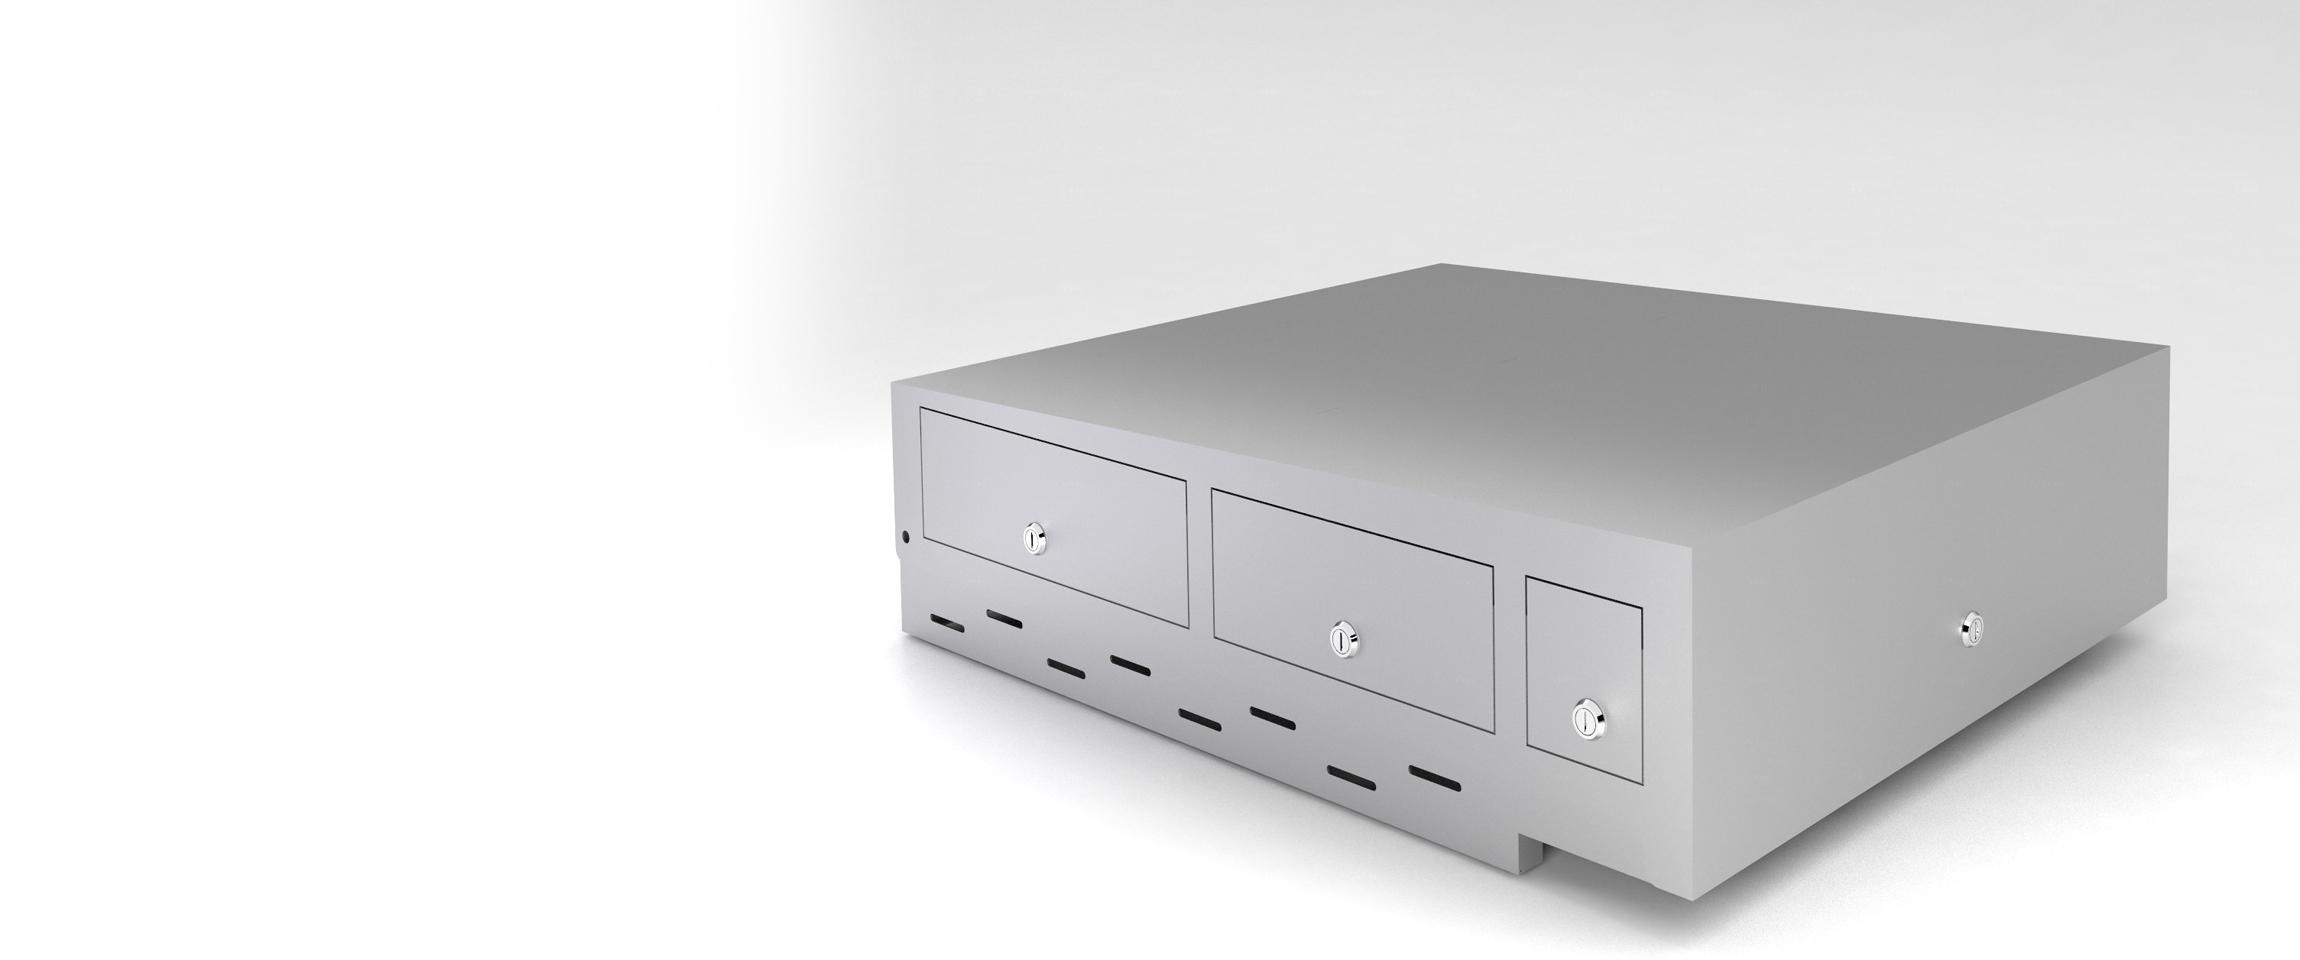 Box NCR 5871